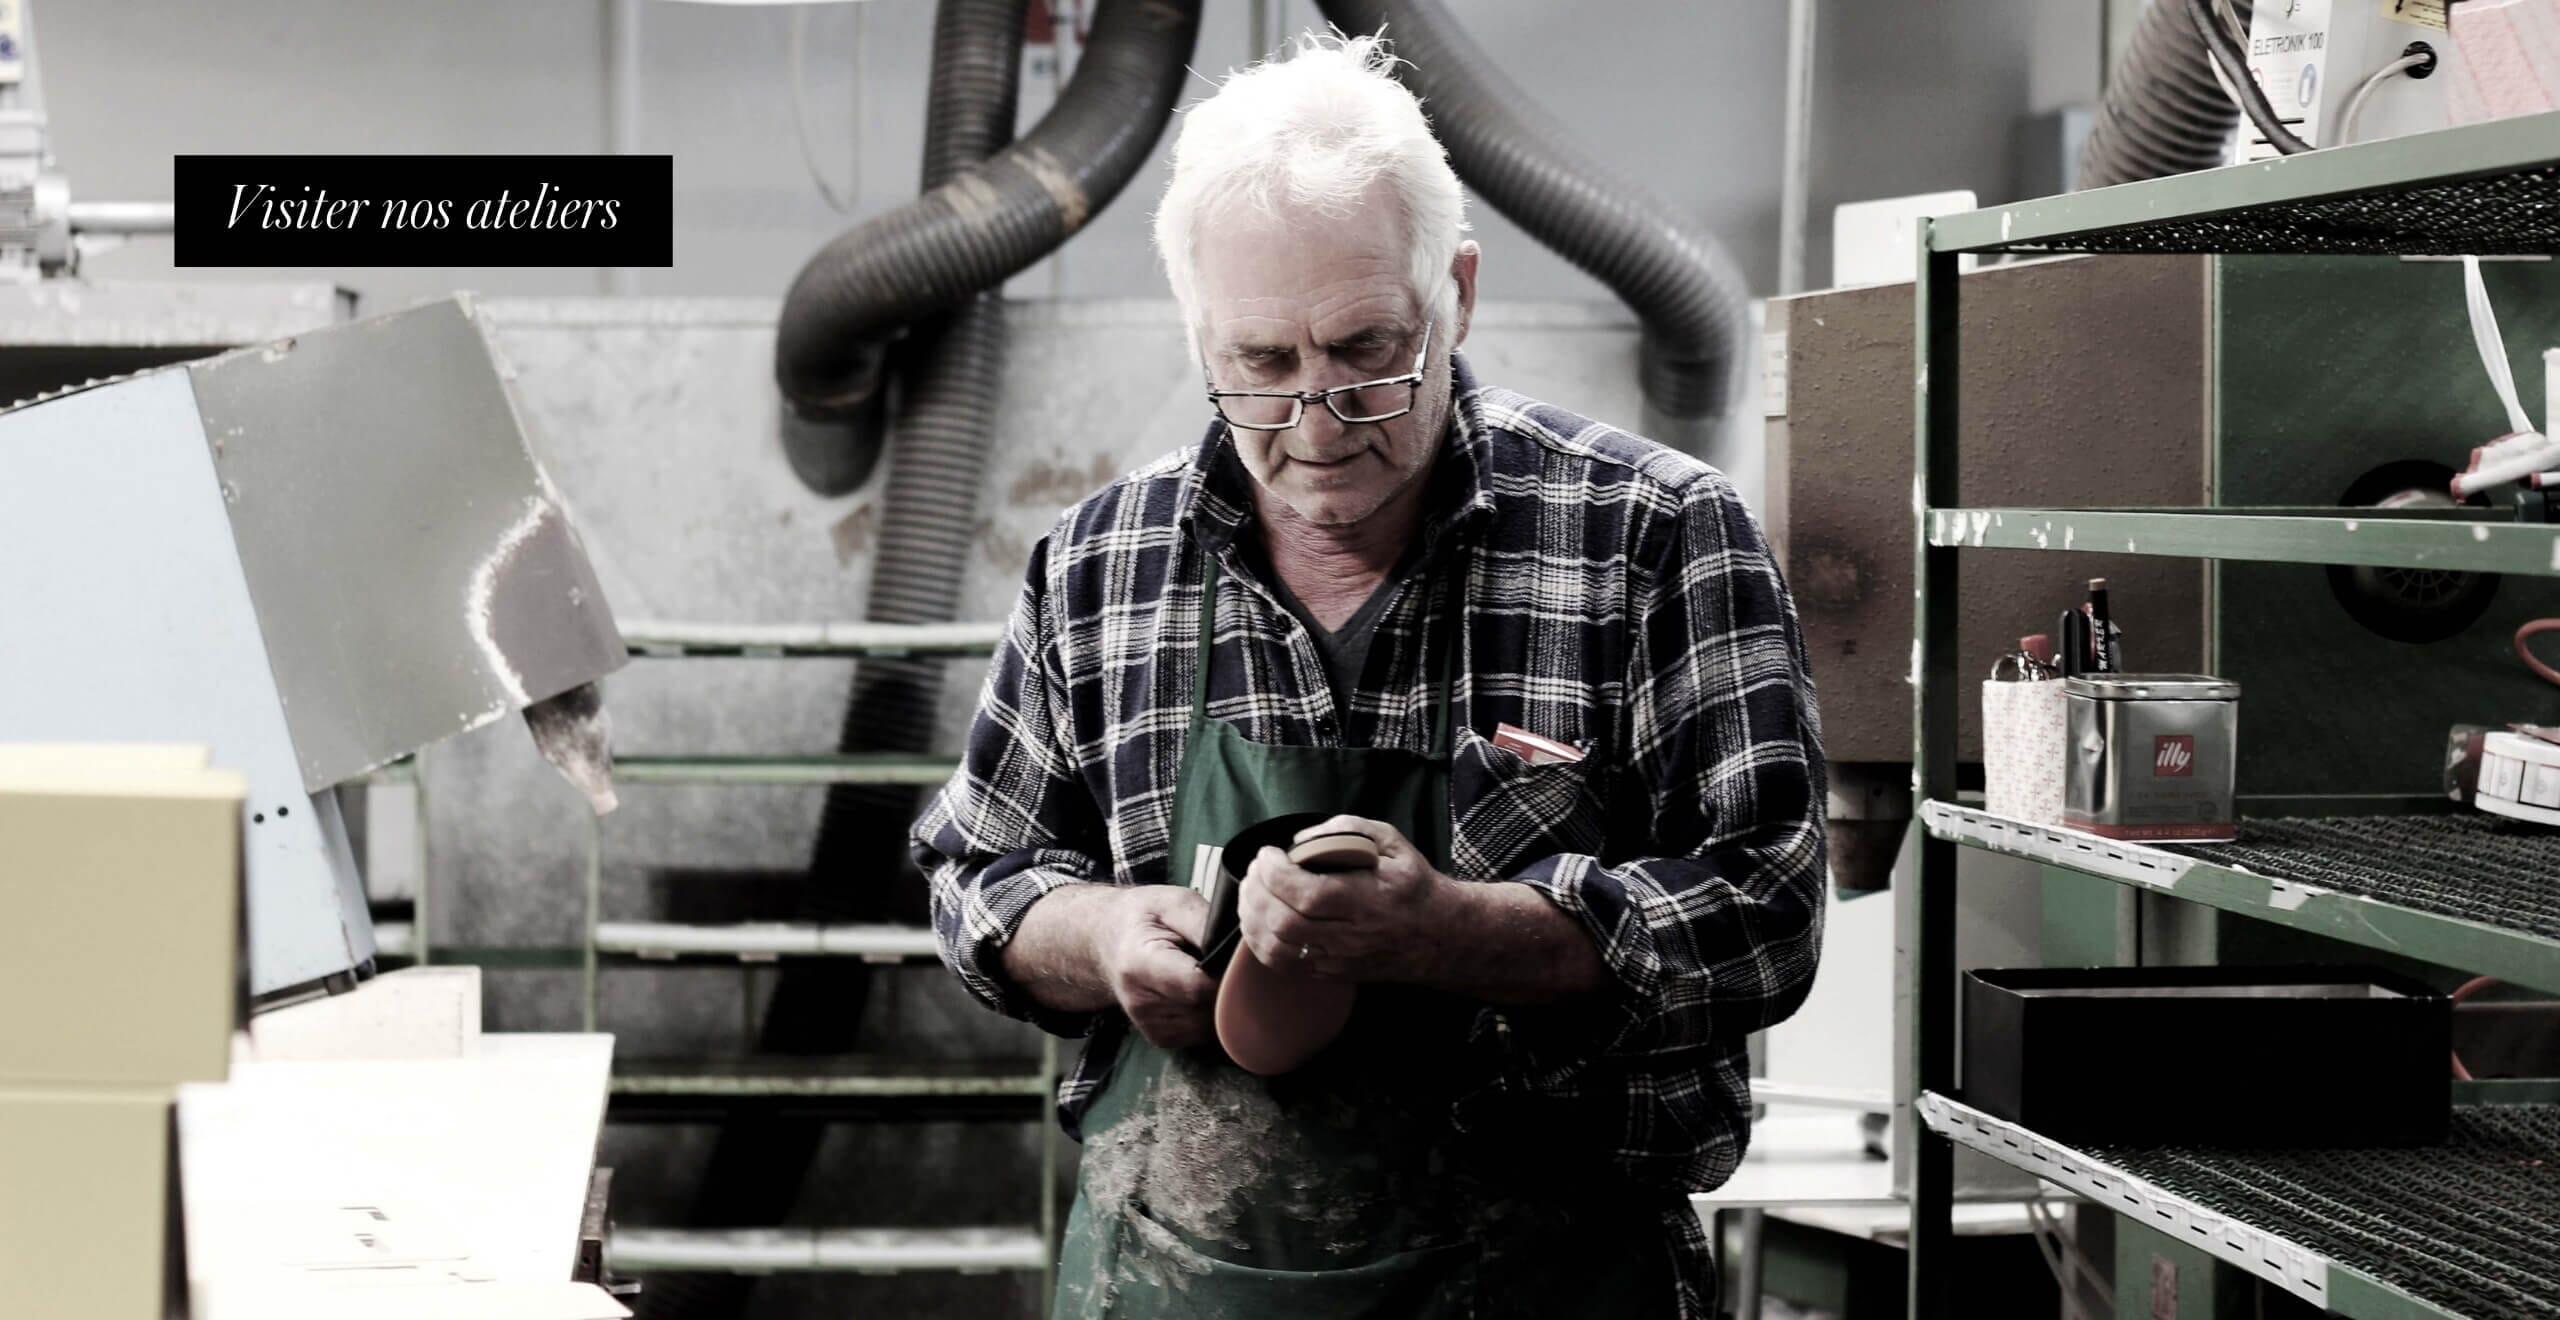 atelier fabrication chaussures a florence en italie jules & jenn